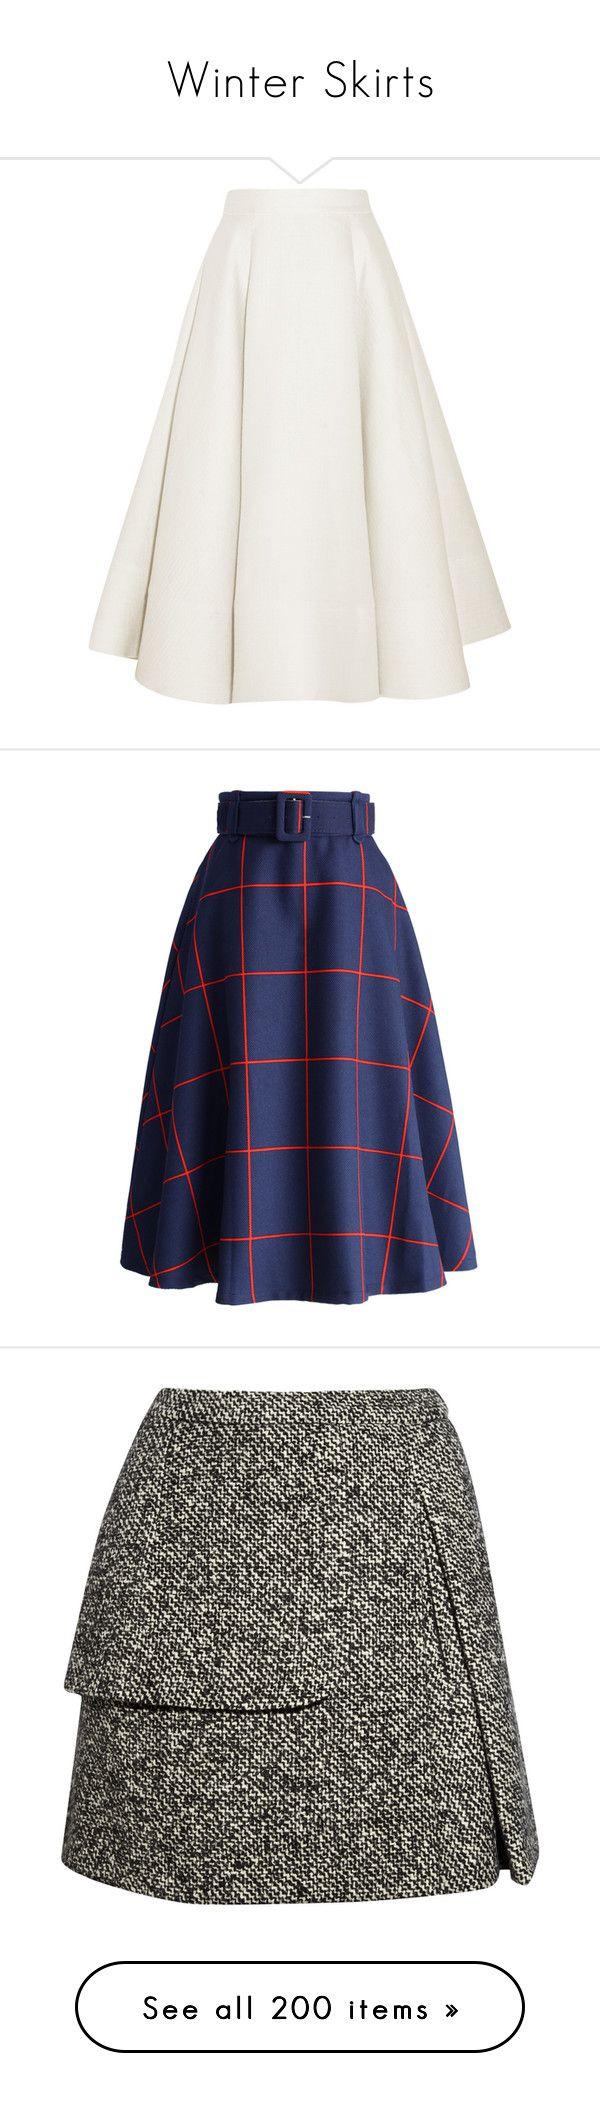 """Winter Skirts"" by pocahaunted666 ❤ liked on Polyvore featuring skirts, white, zipper skirt, knee length a line skirt, midi skirt, embroidered skirt, white knee length skirt, bottoms, jupes and blue"